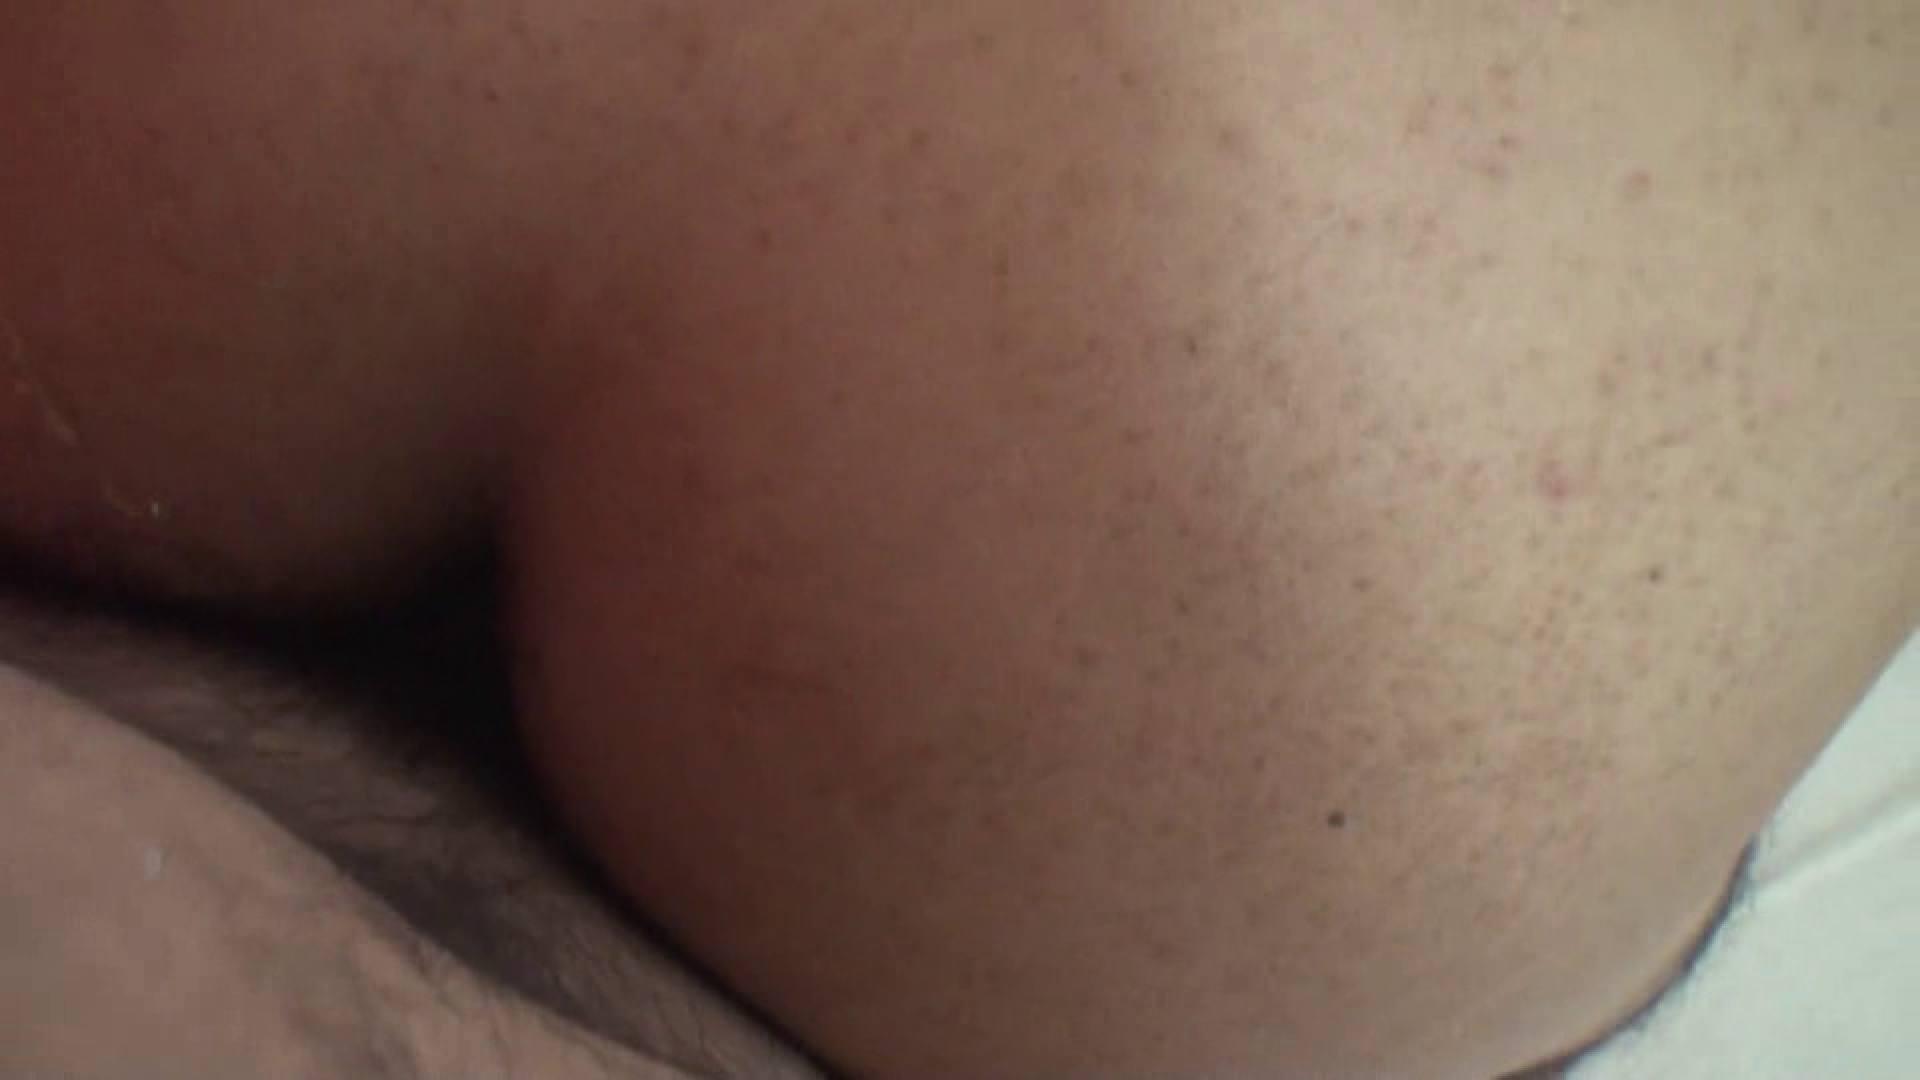 HD 良太と健二当たり前の日常 セックス編 VOL.03 手コキ技あり ちんこ画像 81枚 53